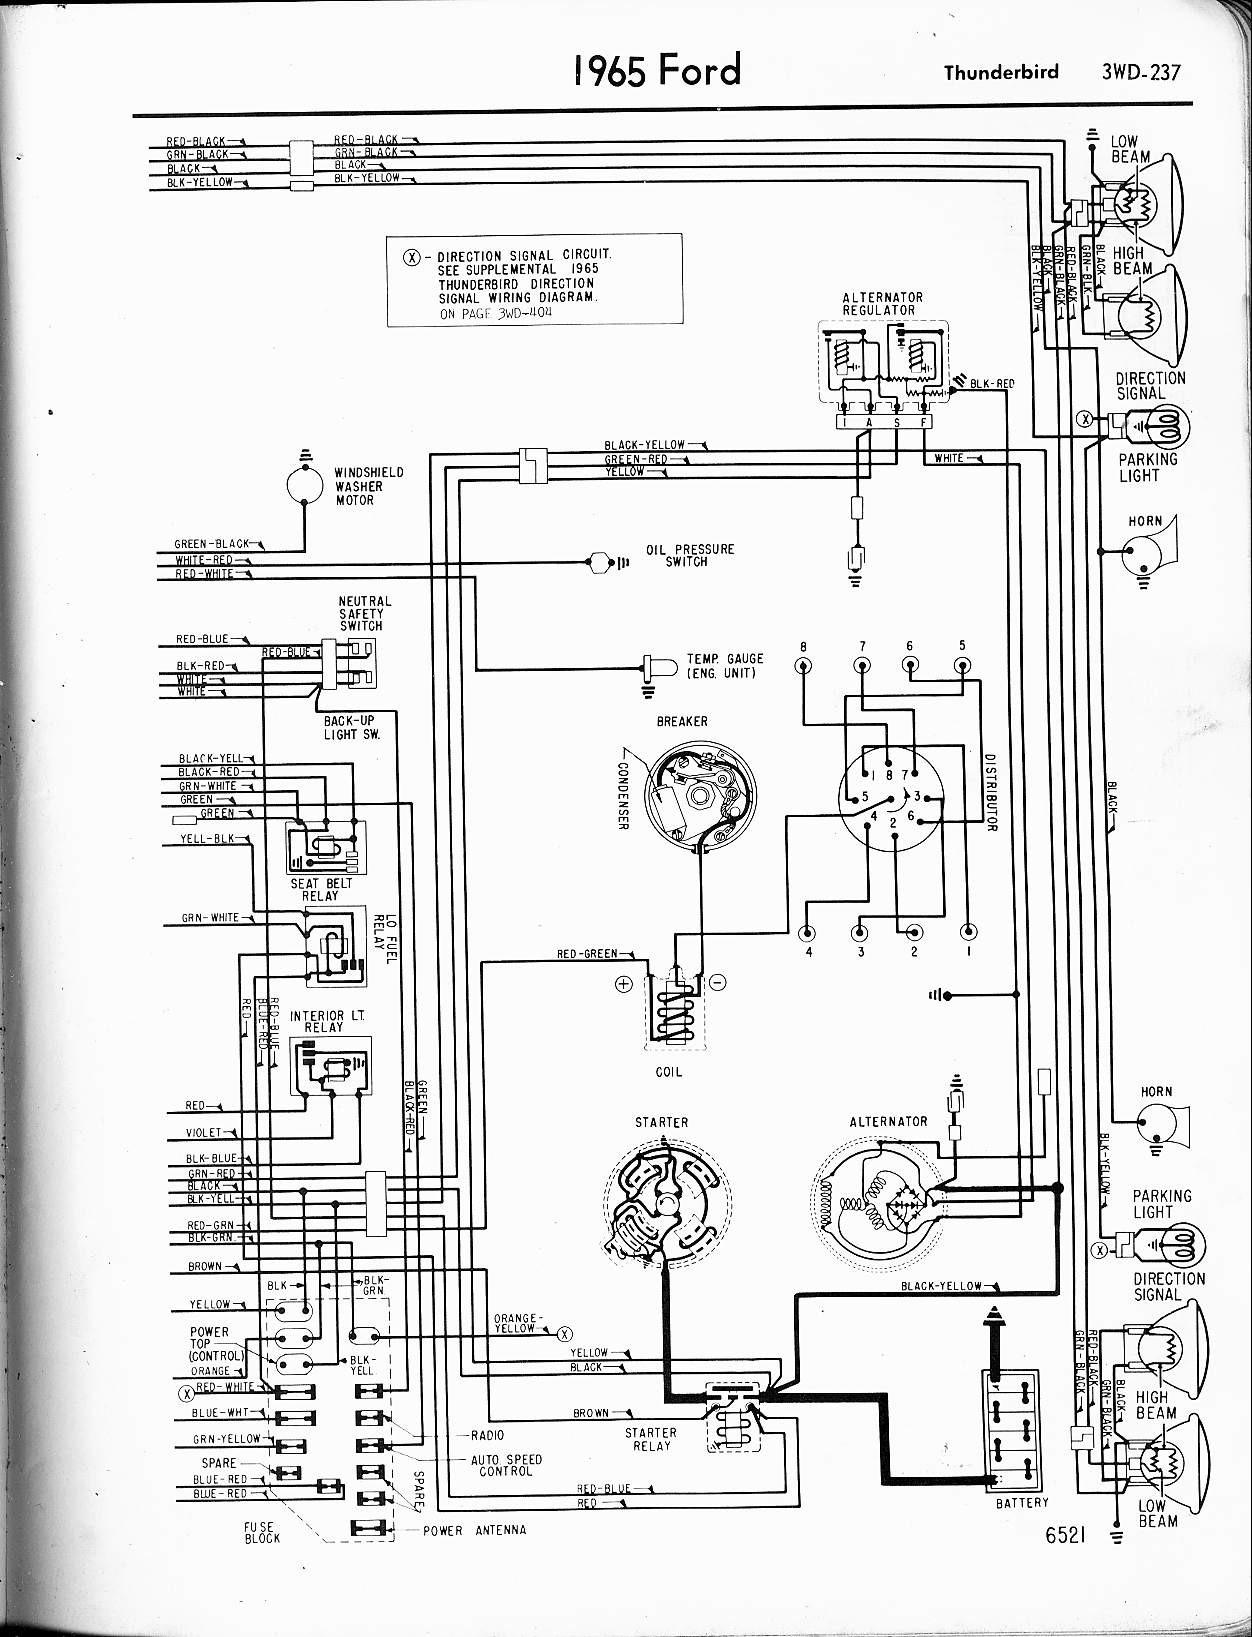 diagram wiring ford econoline wiring diagram alternator truck tail 1955 Ford Turn Signal Wiring Diagram 56